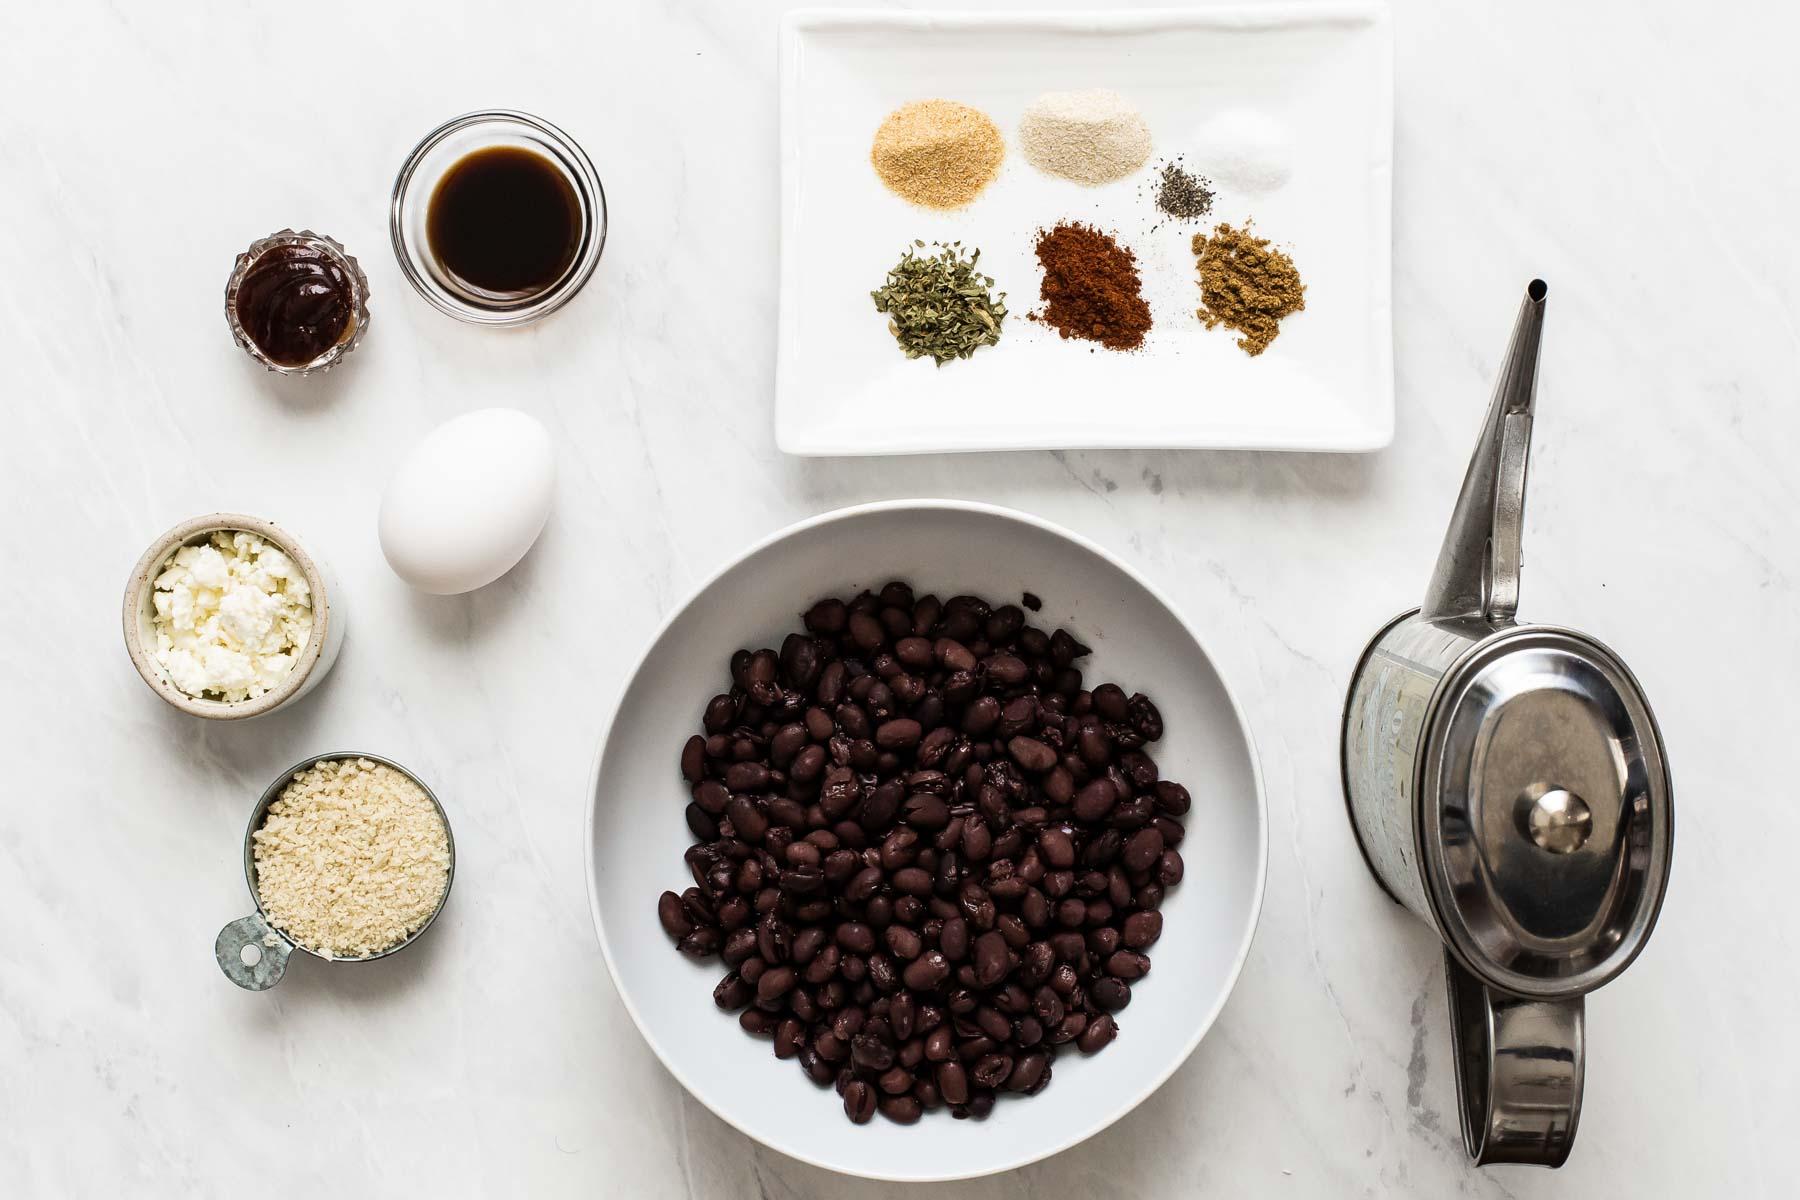 Ingredients for black bean burger recipe.